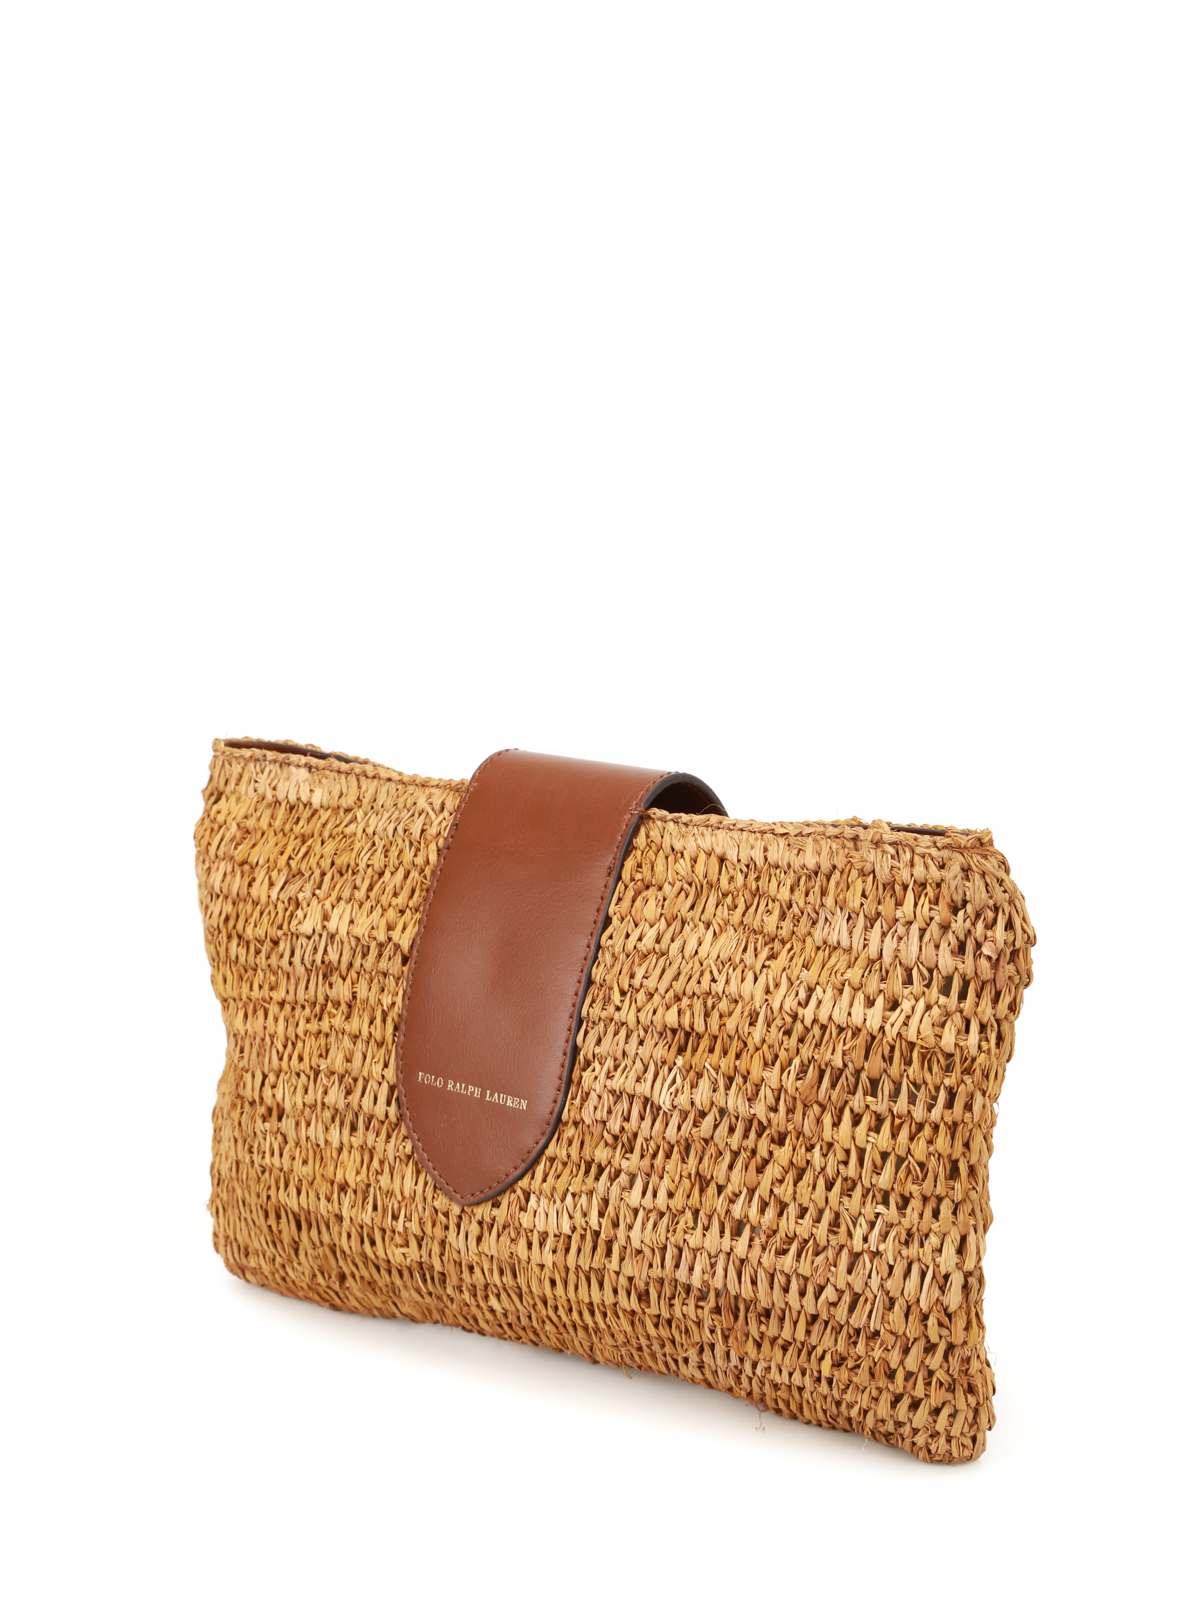 meilleures baskets f9285 eedf4 Polo Ralph Lauren - Pochette - Lennox S - Clutch - 428696198001